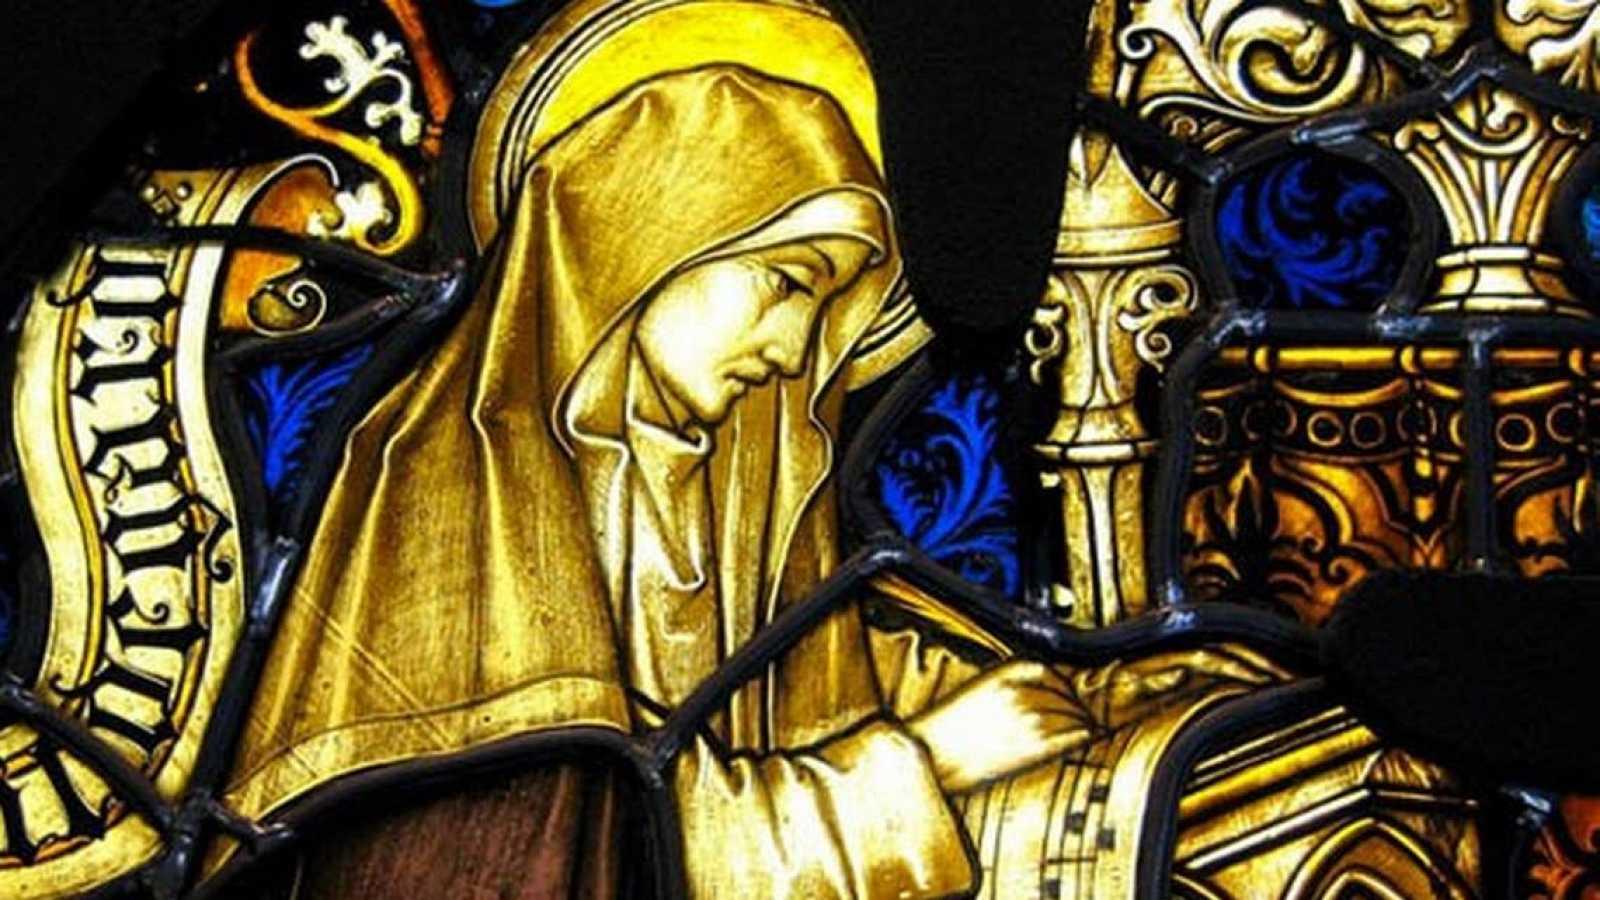 Sinfonía de la mañana - Hildegard con Bingen (con entrevista a Ángeles Caso) - 23/11/16 - Escuchar ahora